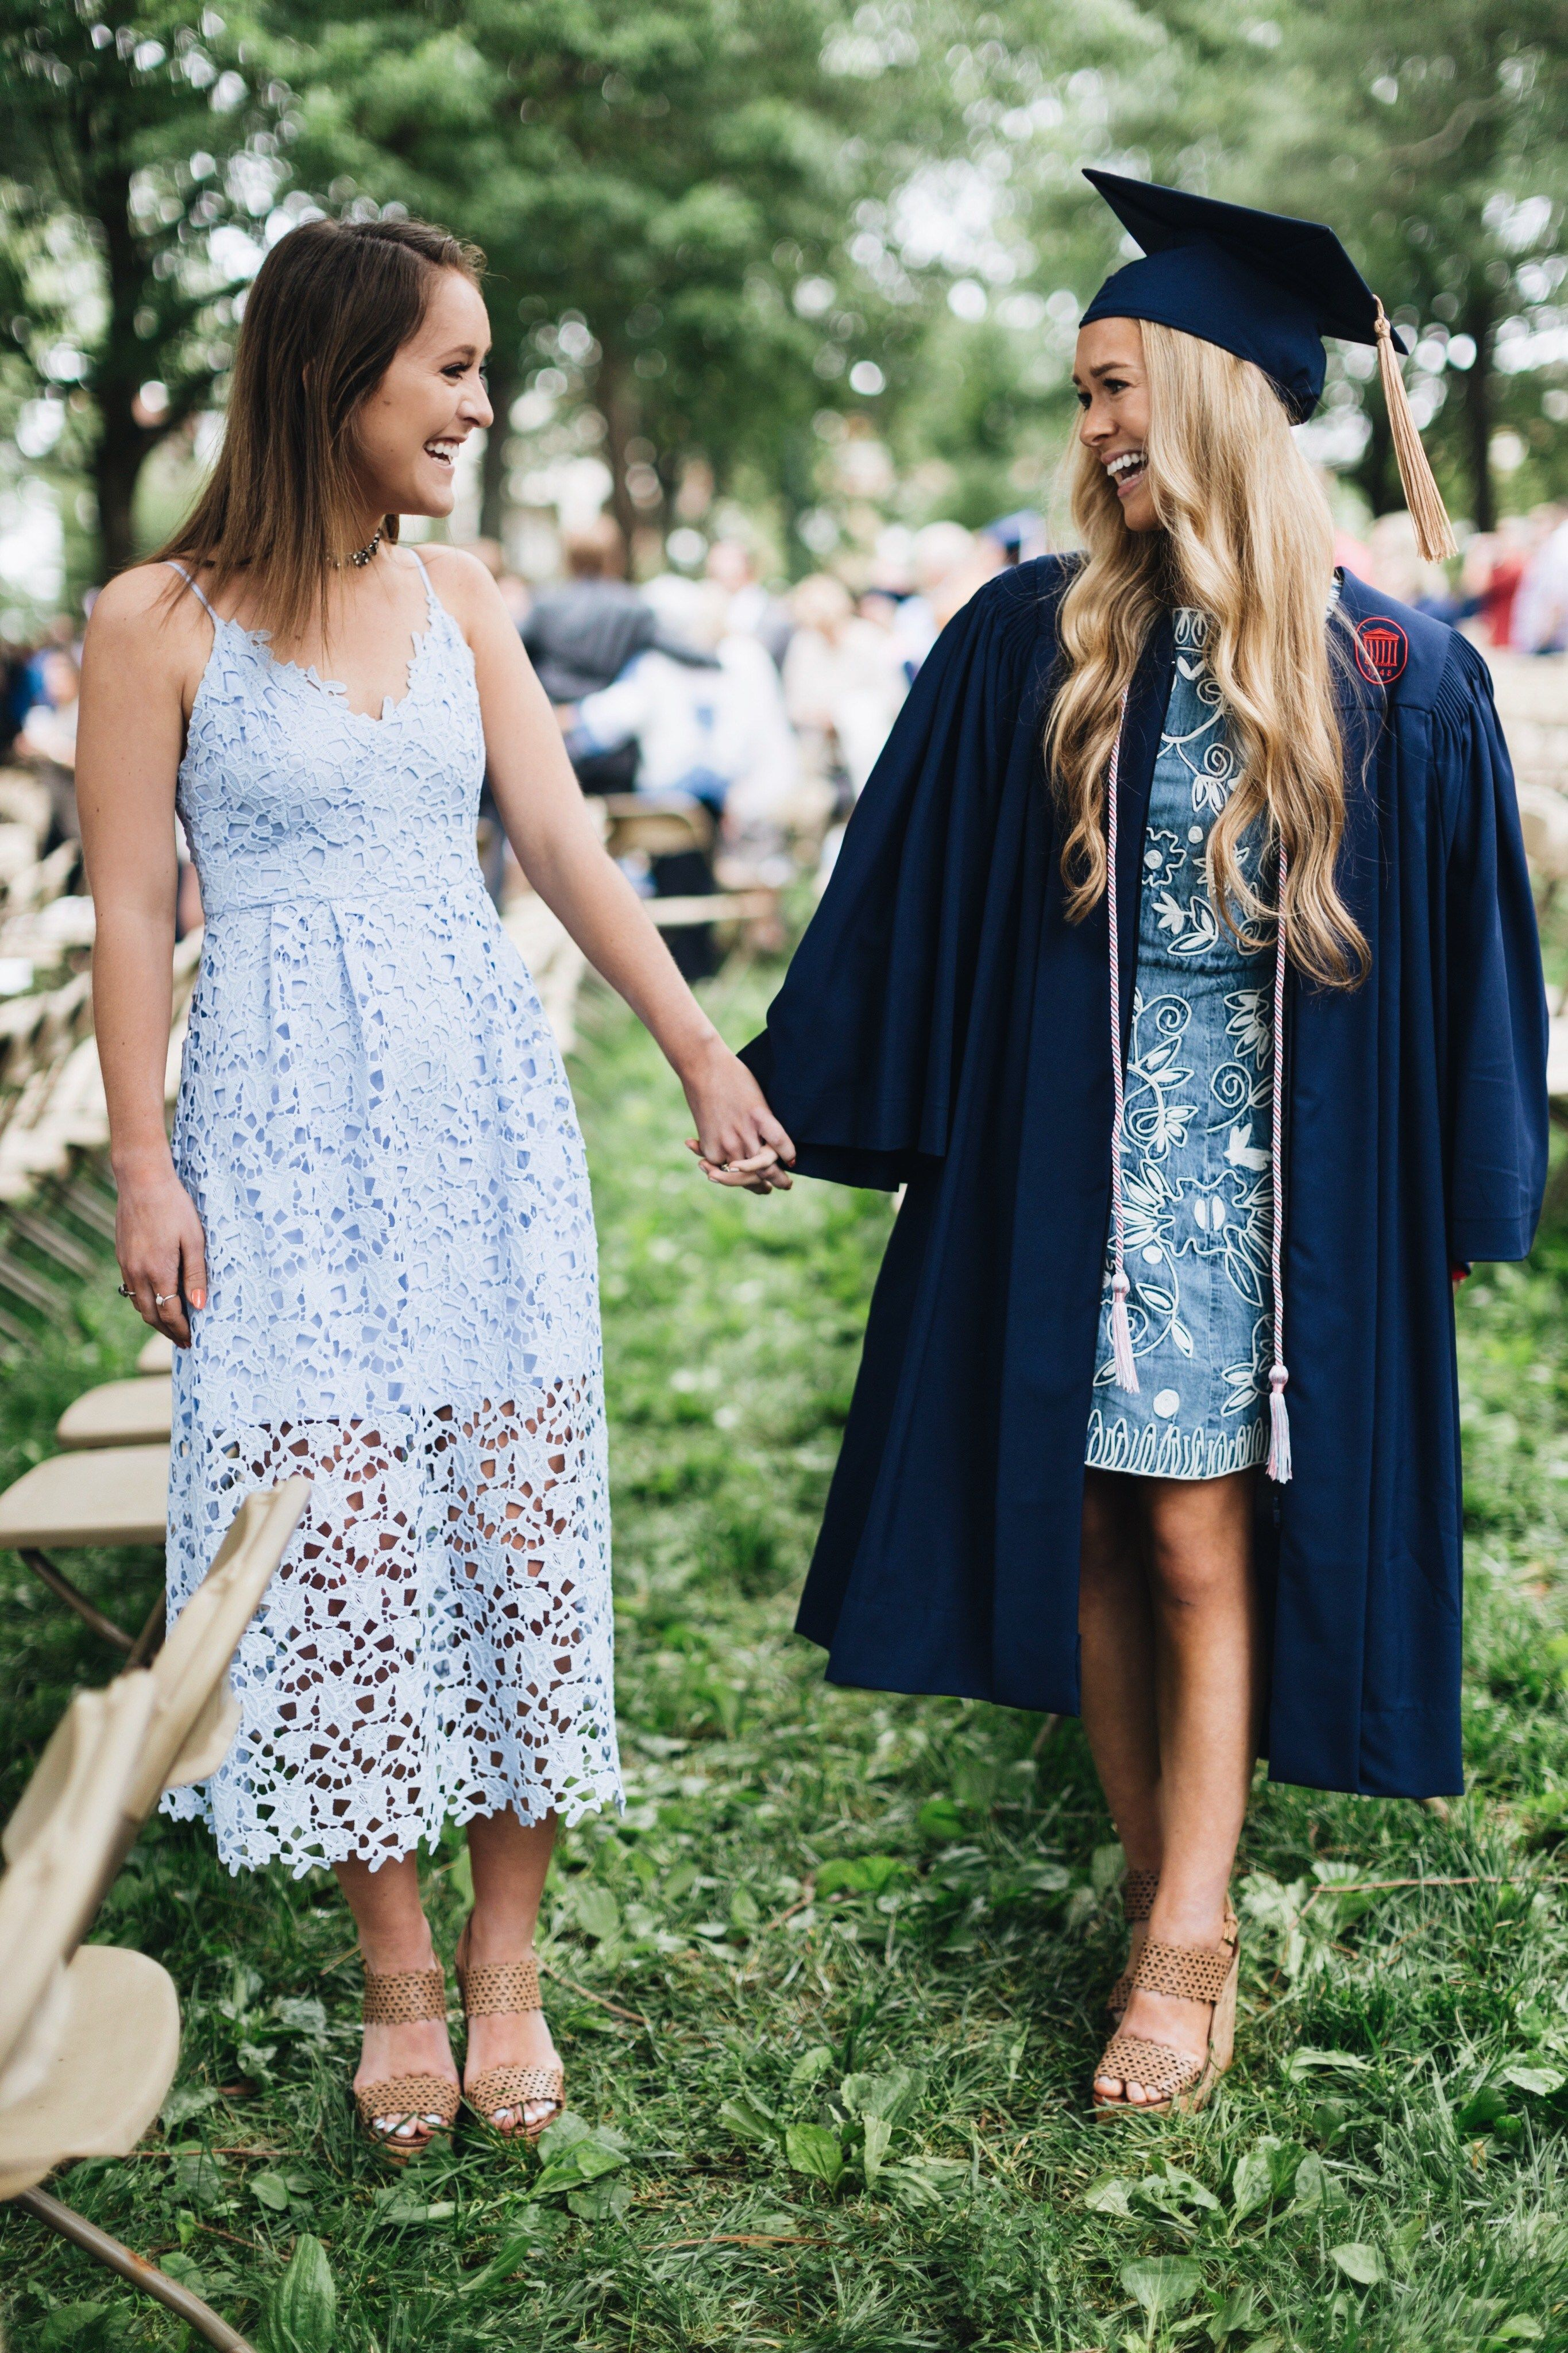 Graduation dresses | { summer & spring } in 2019 ...